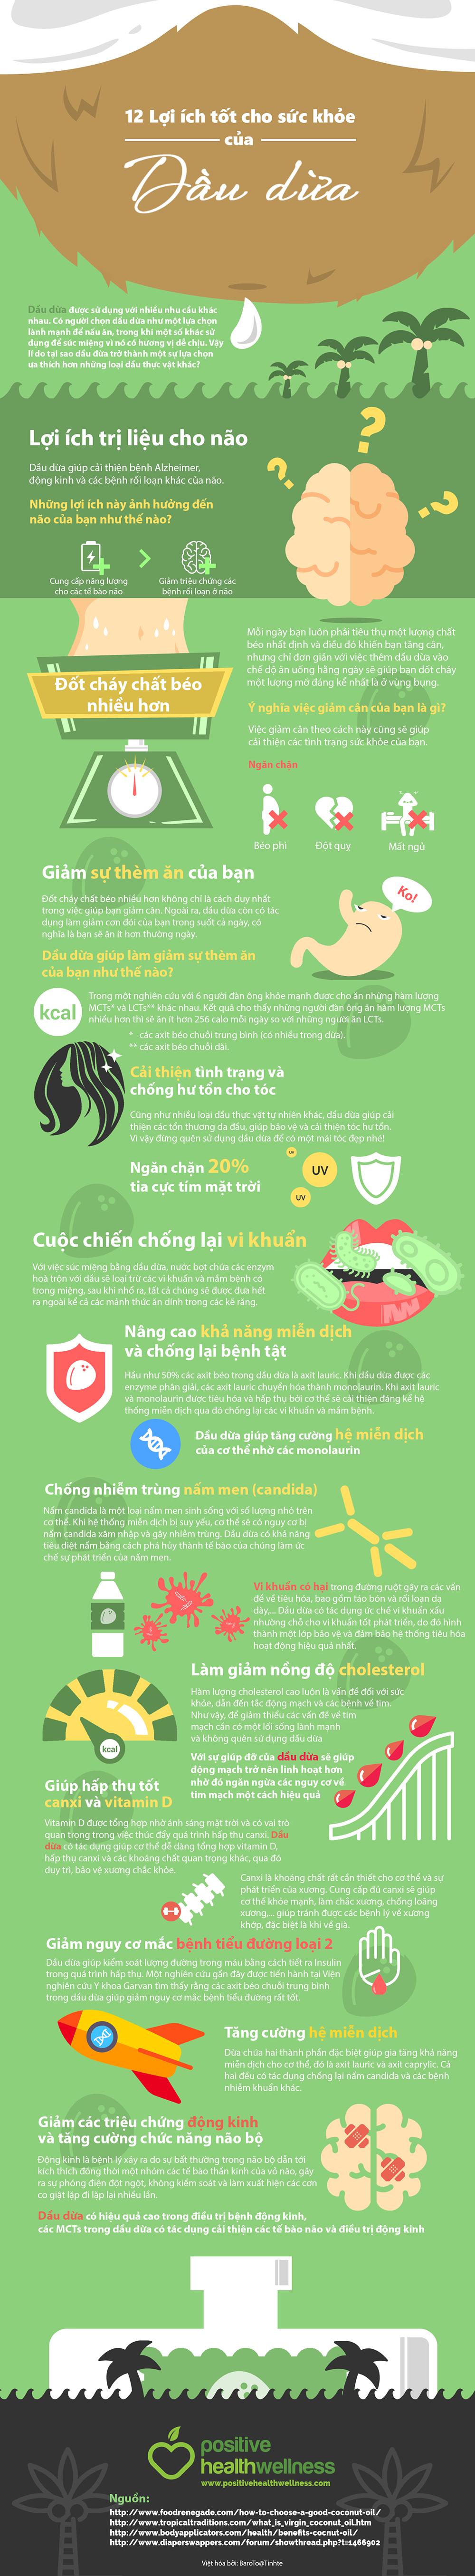 12 lợi ích của dầu dừa